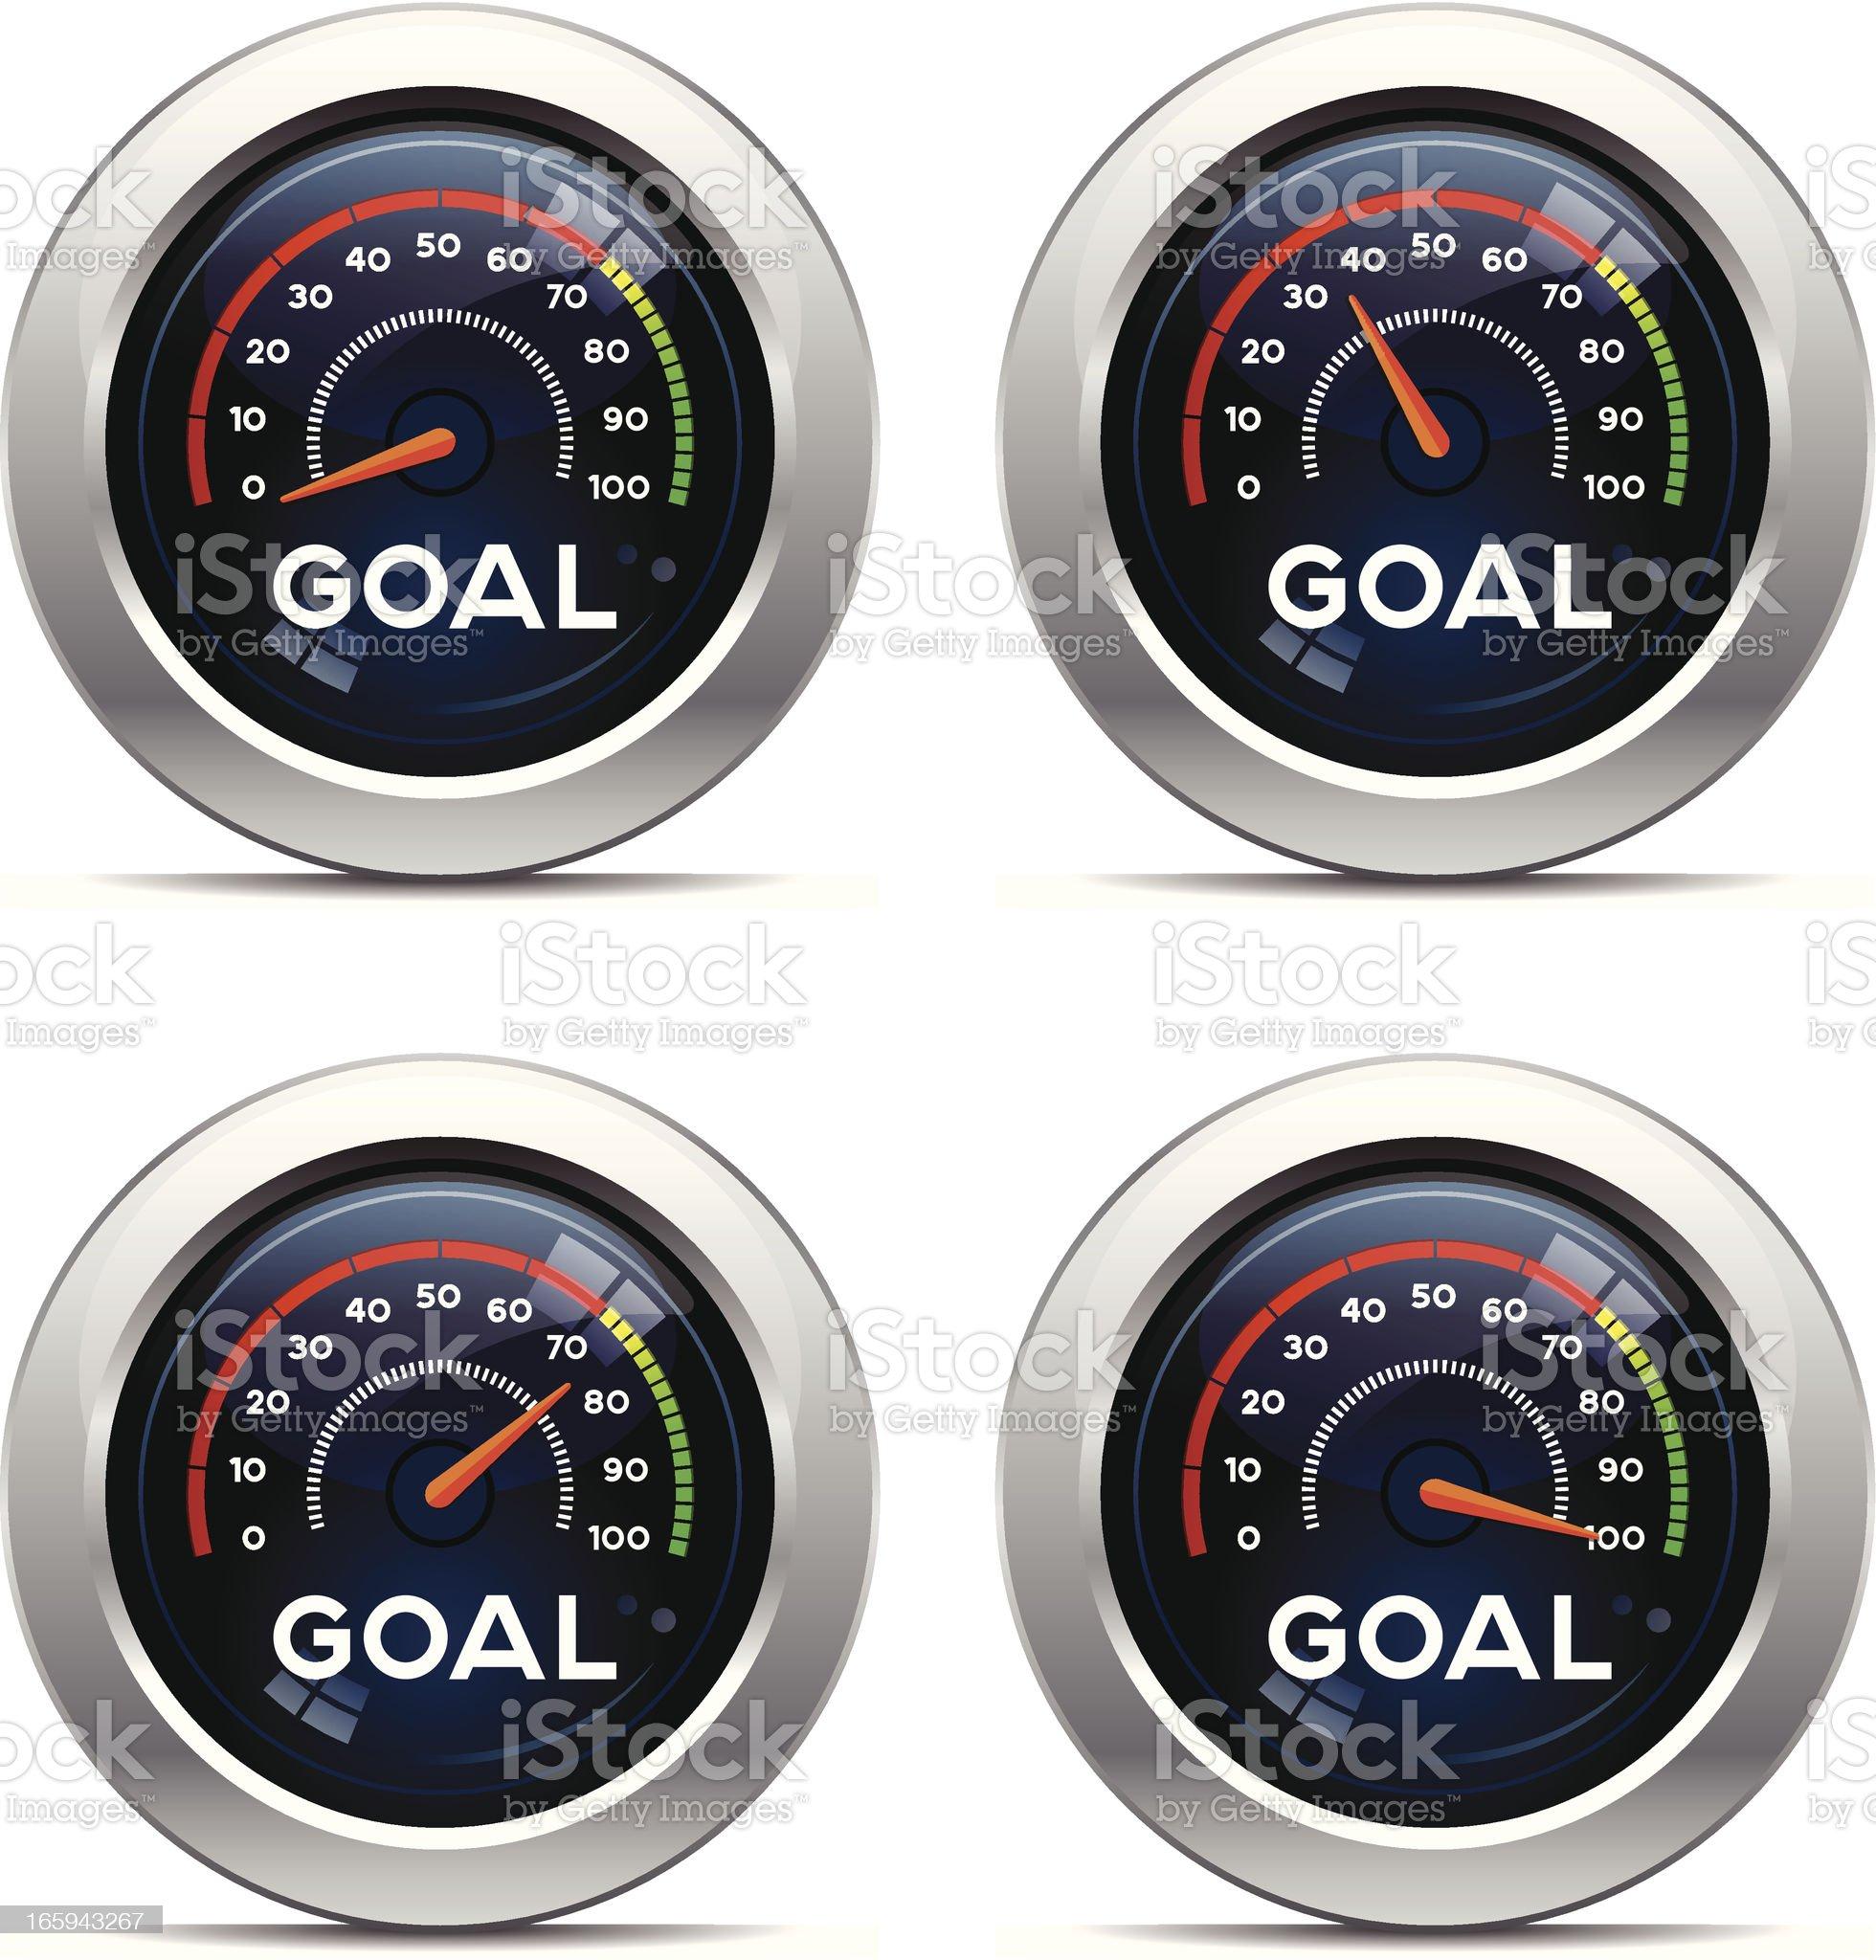 Goal Dashboard royalty-free stock vector art